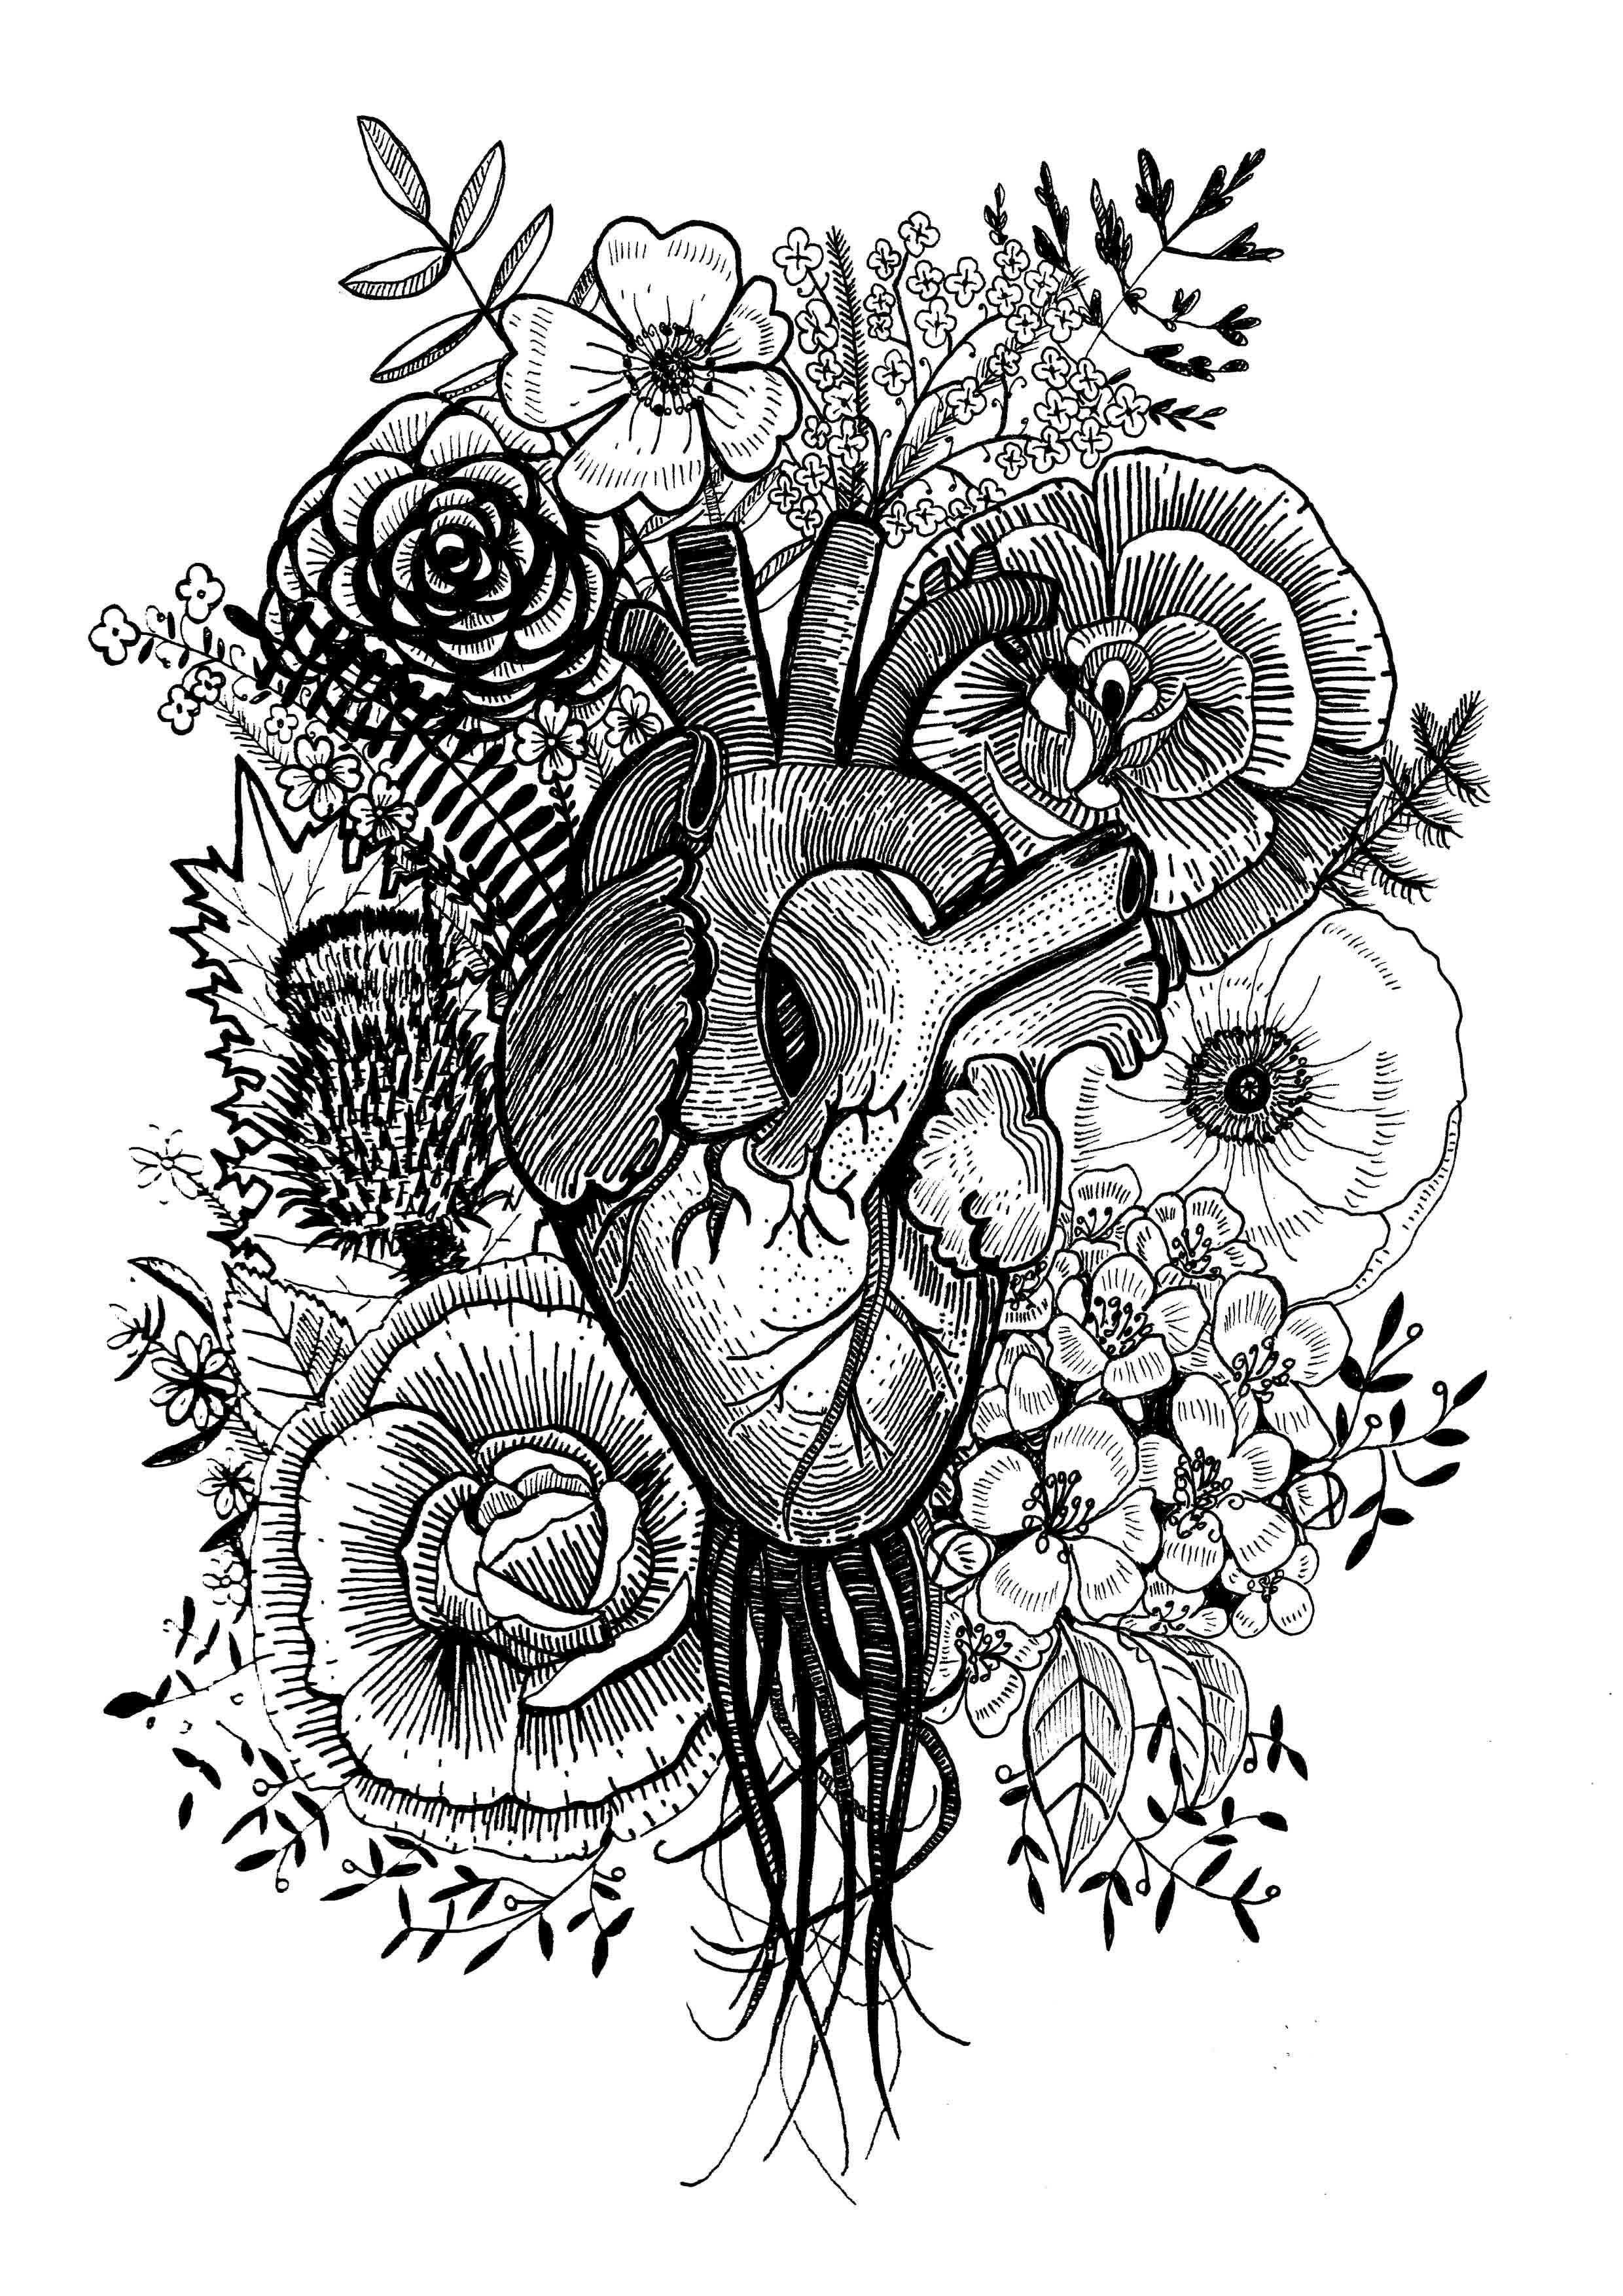 Anatomical Heart tattoo design 2015.